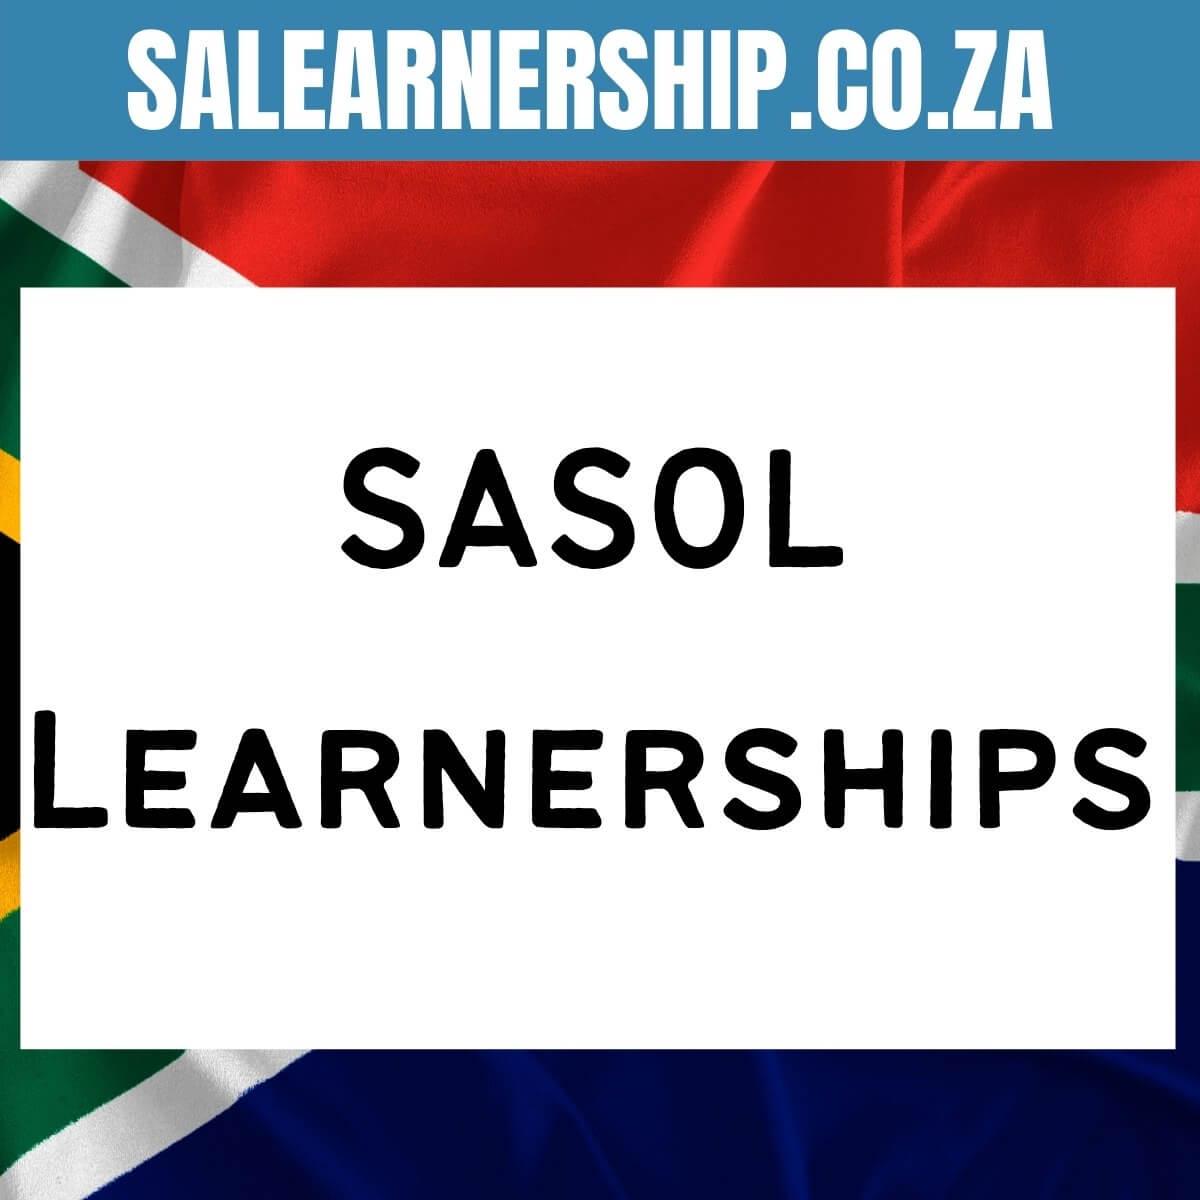 sasol learnerships